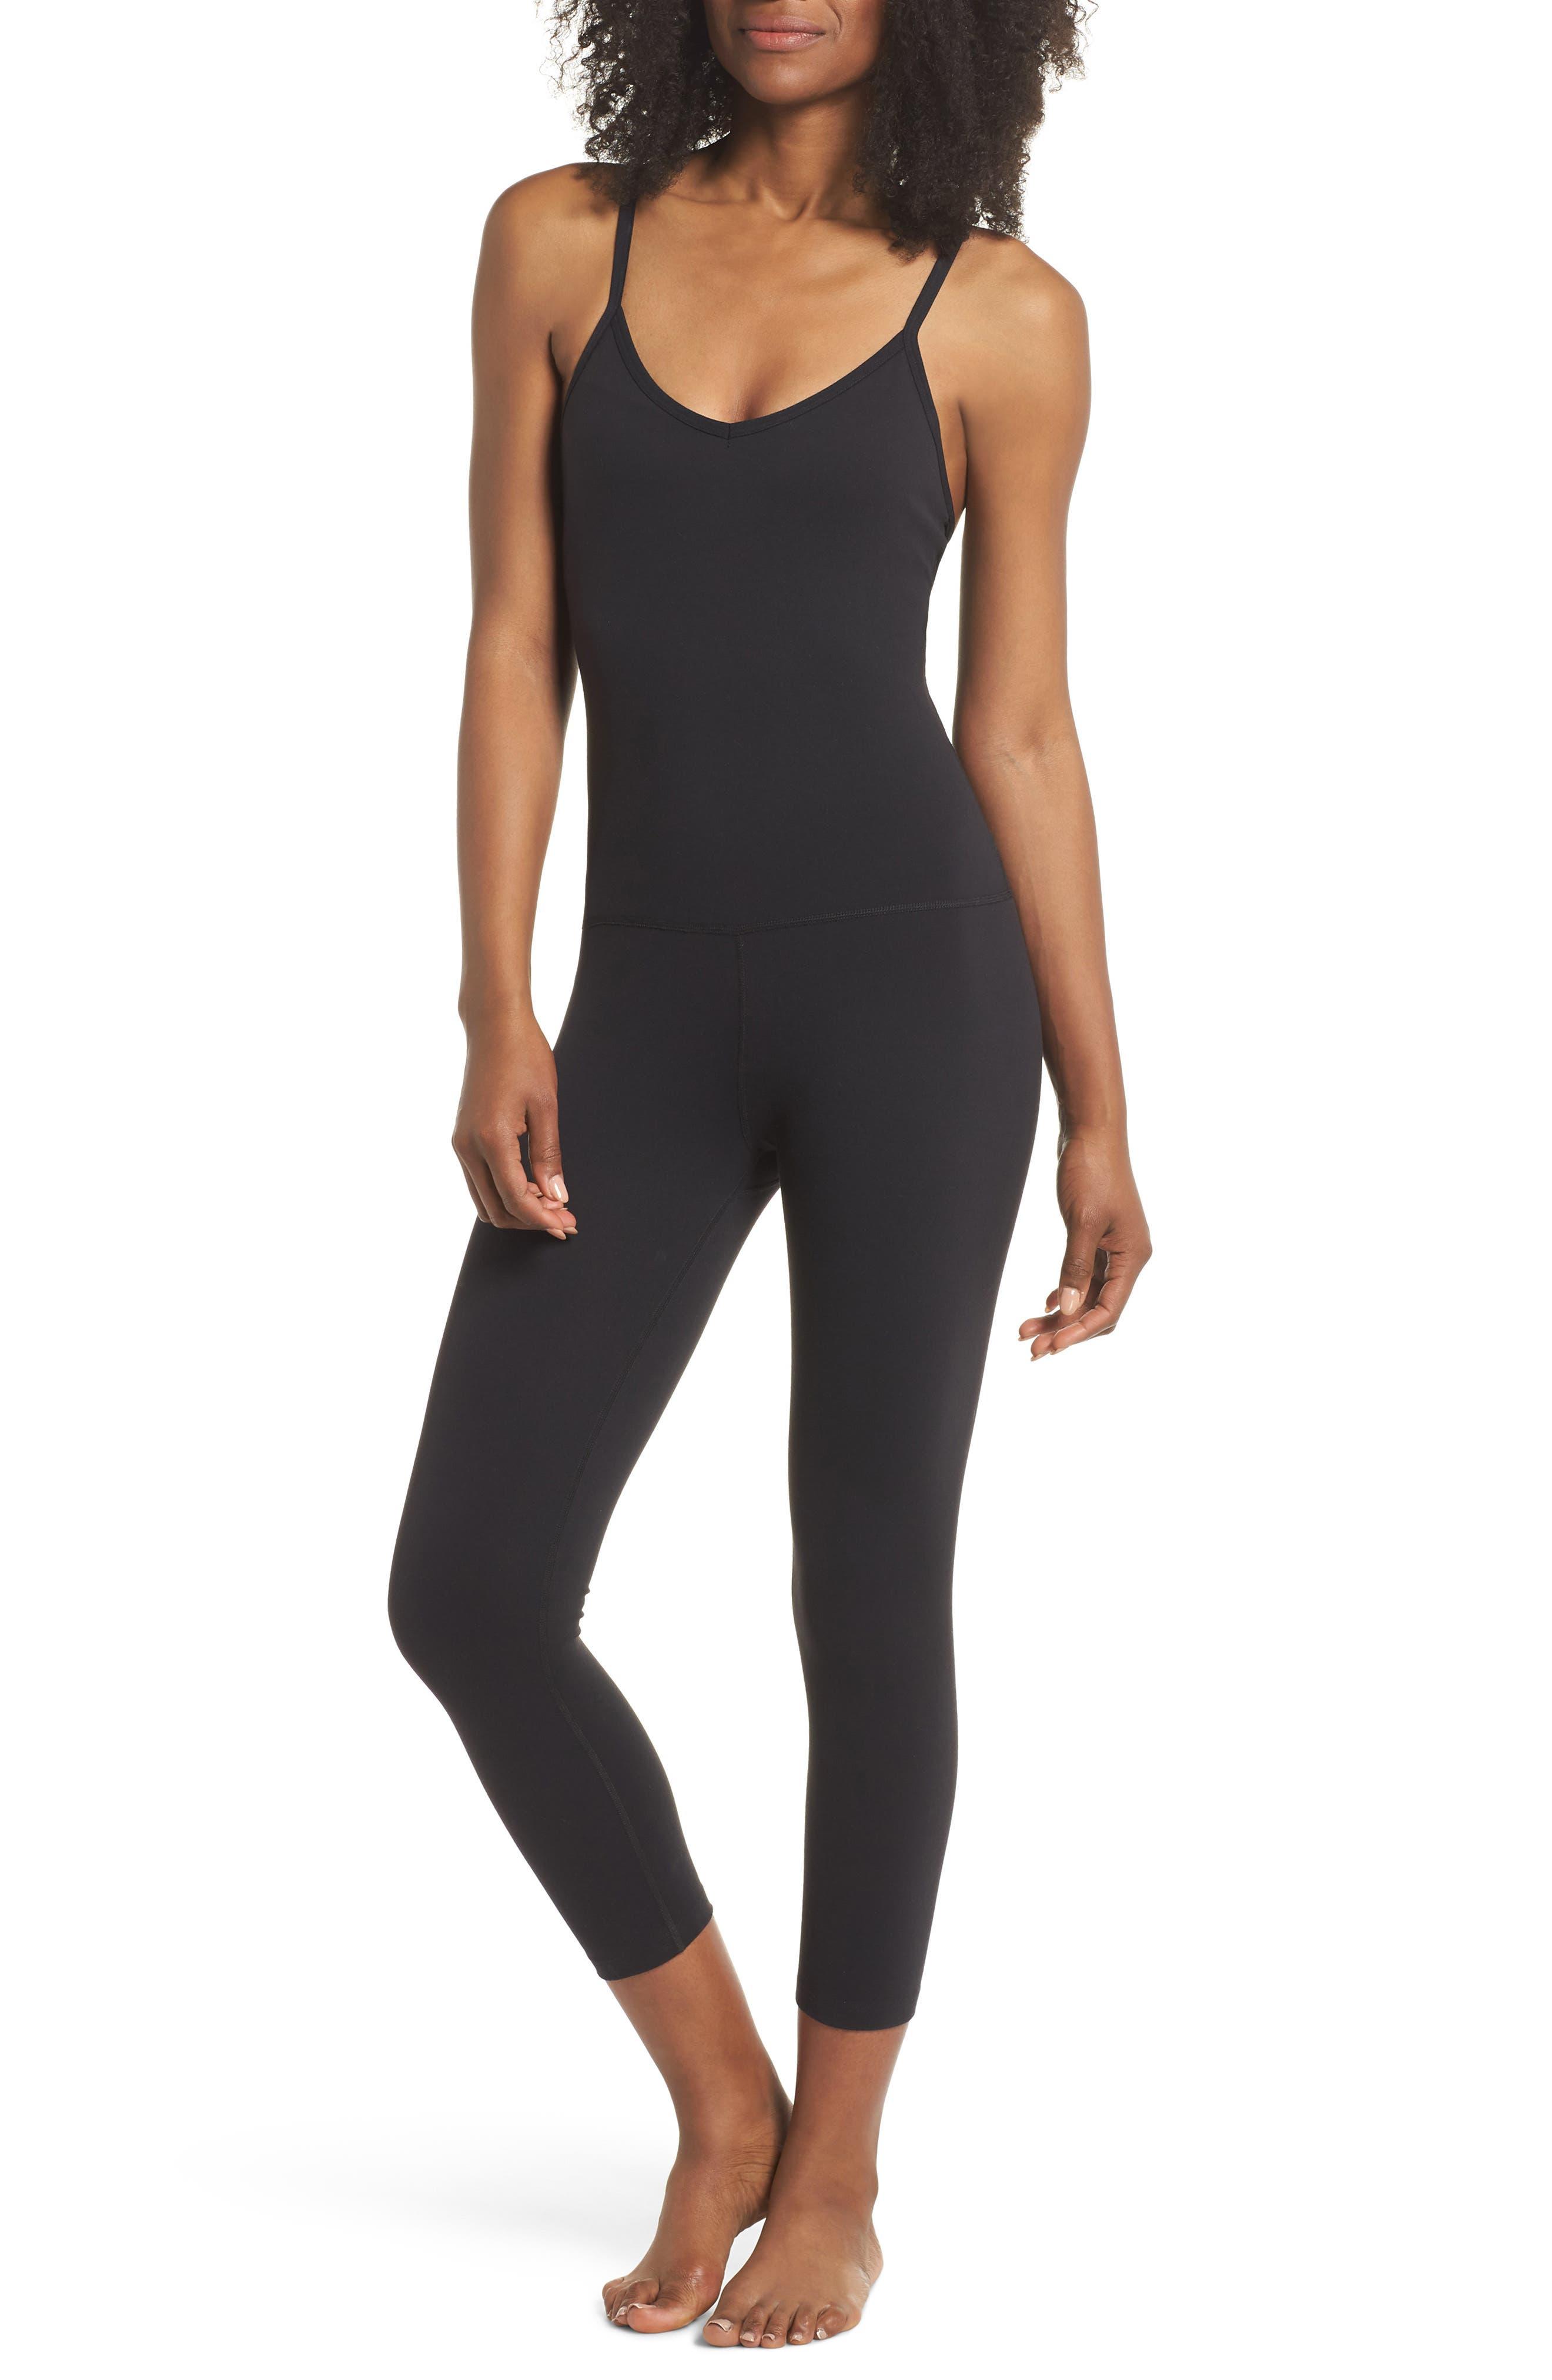 Alternate Image 1 Selected - Beyond Yoga Levels Shelf Bra Bodysuit